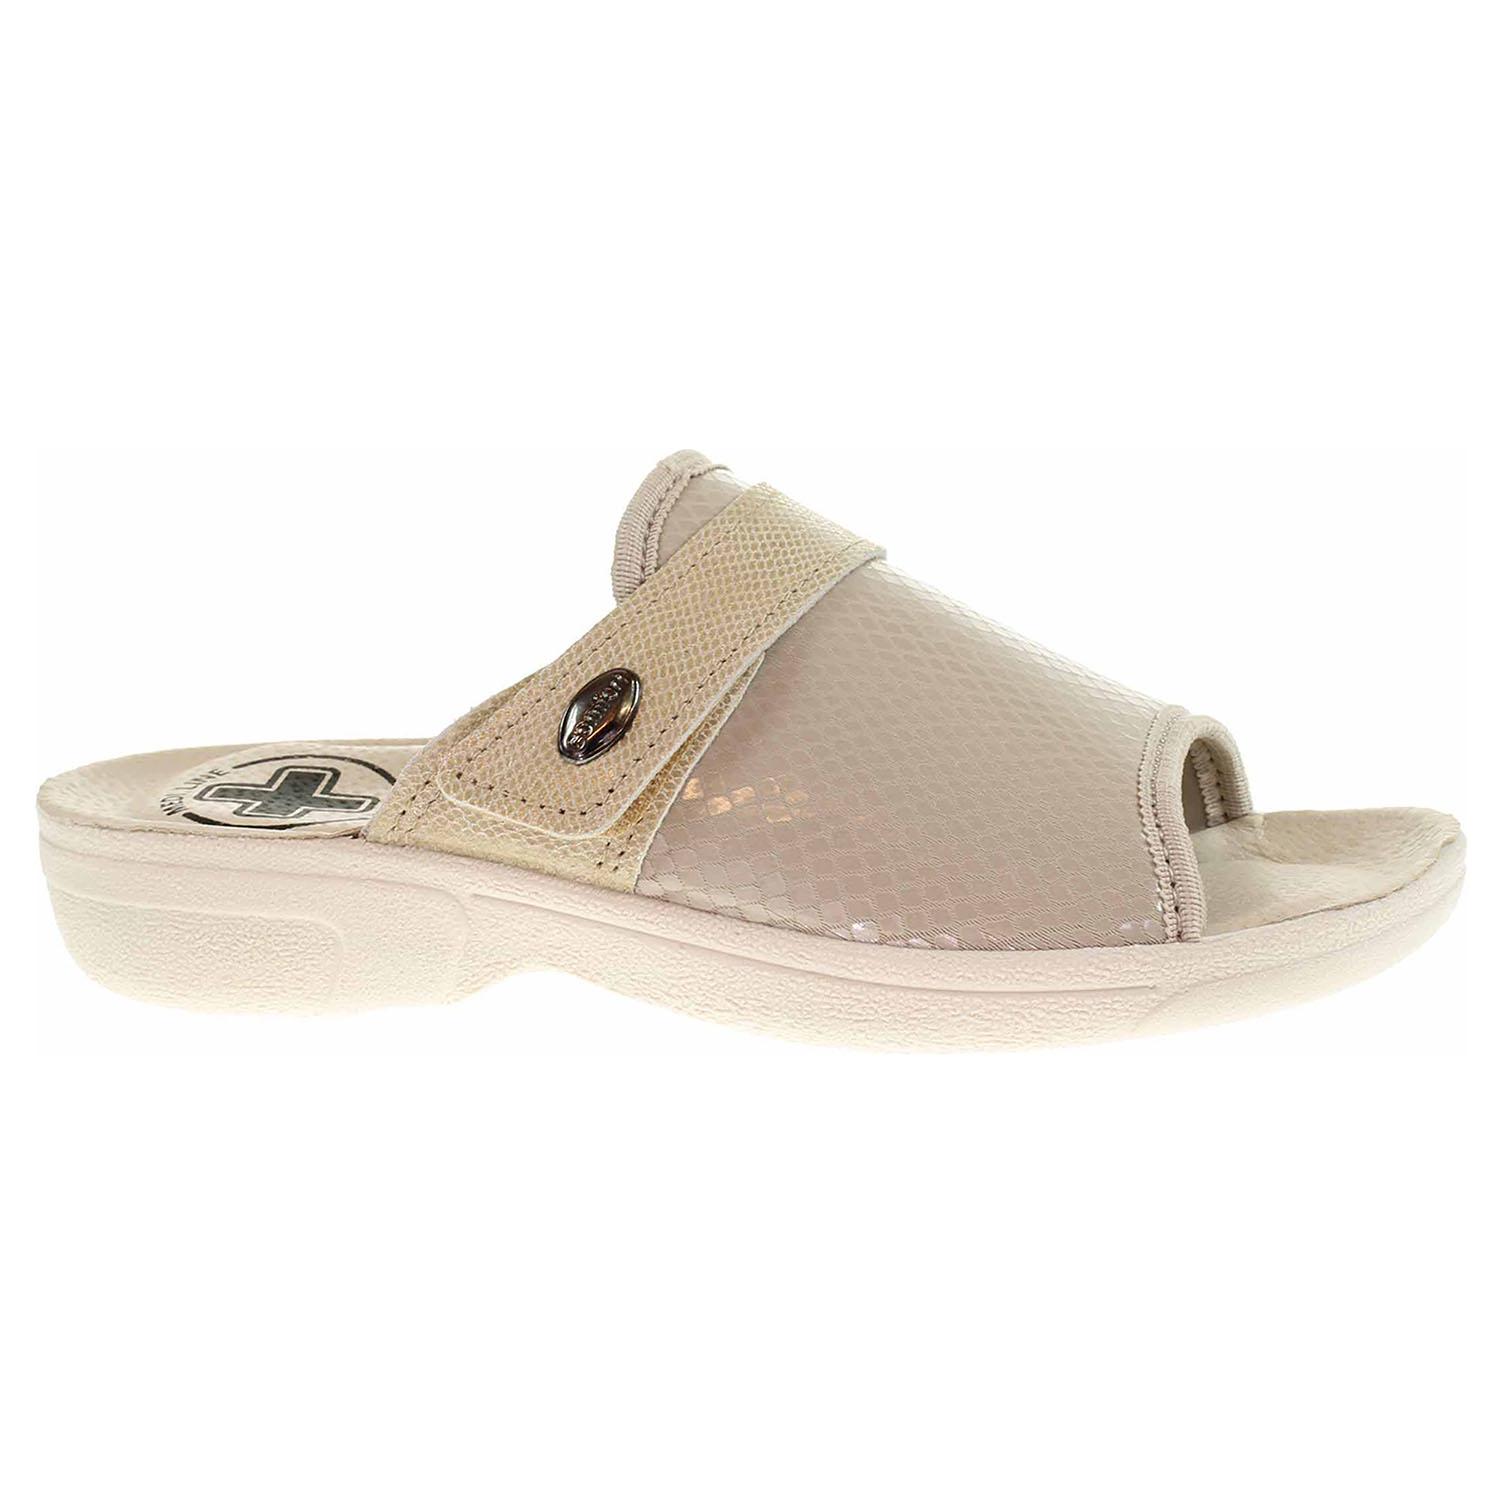 Dámské domácí pantofle Medi Line 1416 beige 1416 beige 39